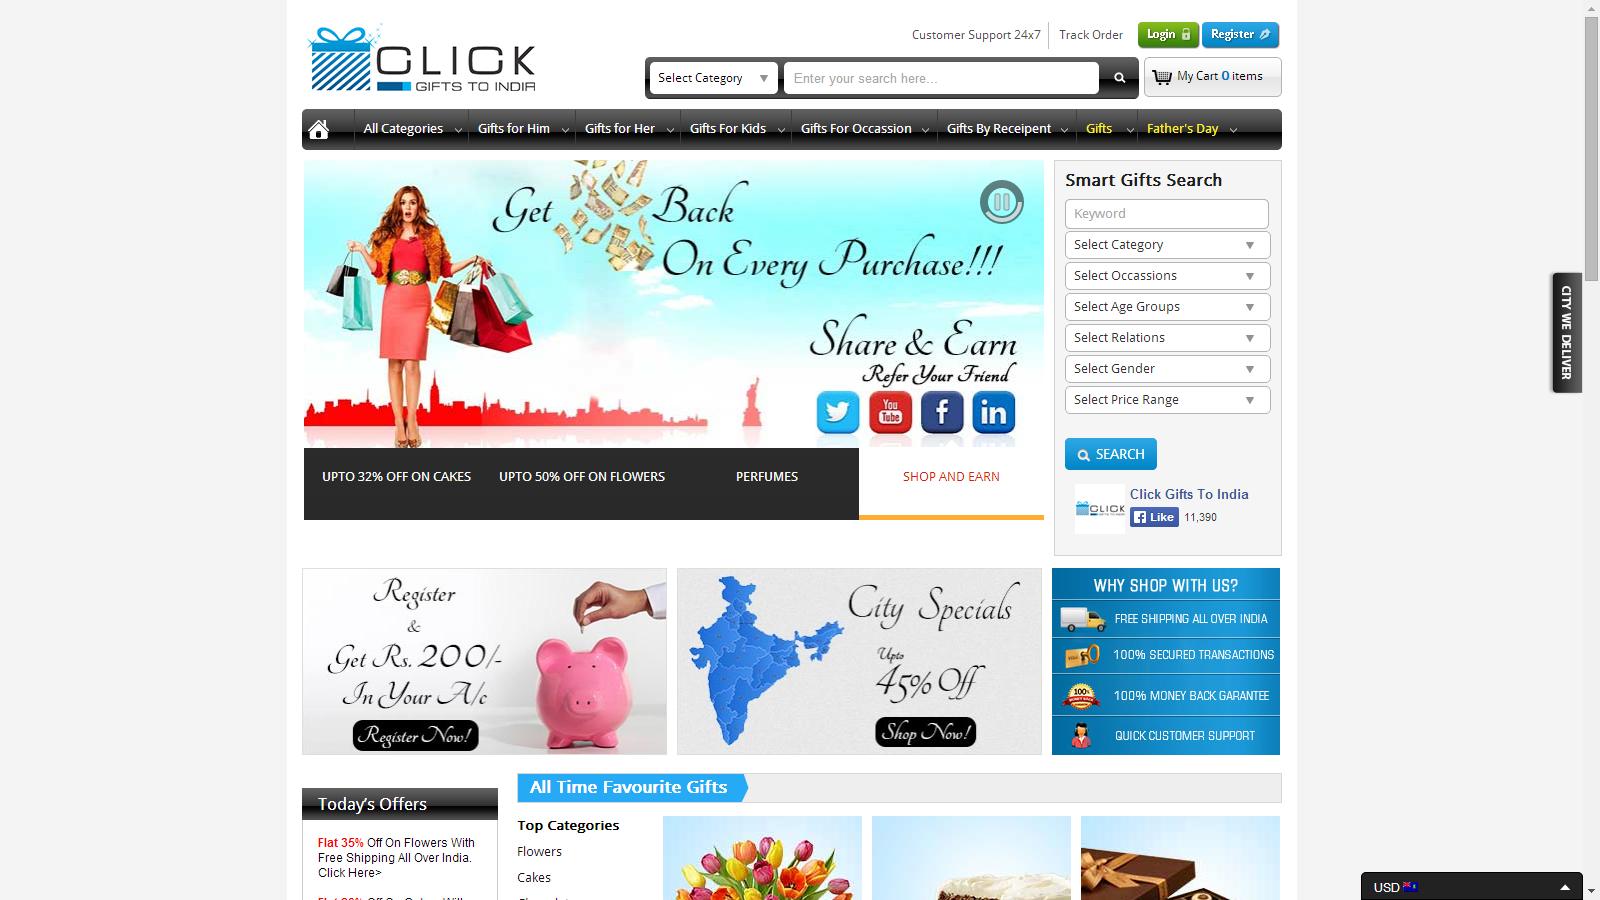 Clickgiftstoindia.com - www.clickgiftstoindia.com